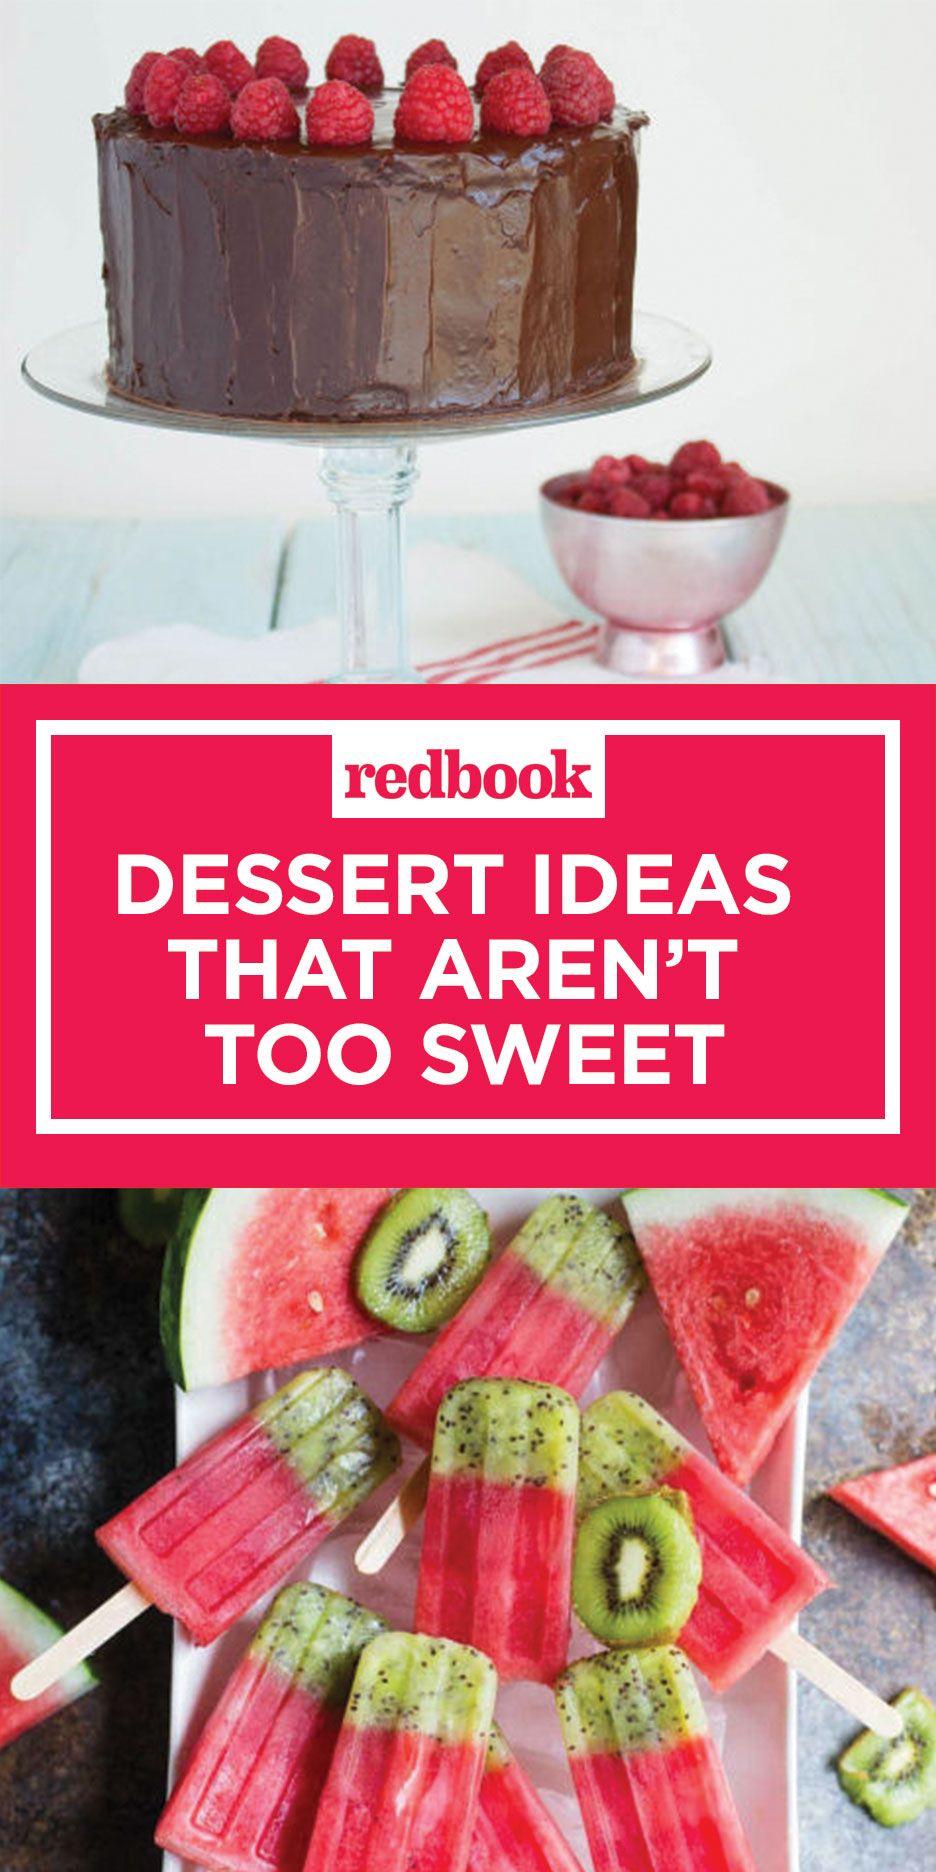 20 Sugar Free Dessert Recipes Naturally Sweetened Dessert Recipes